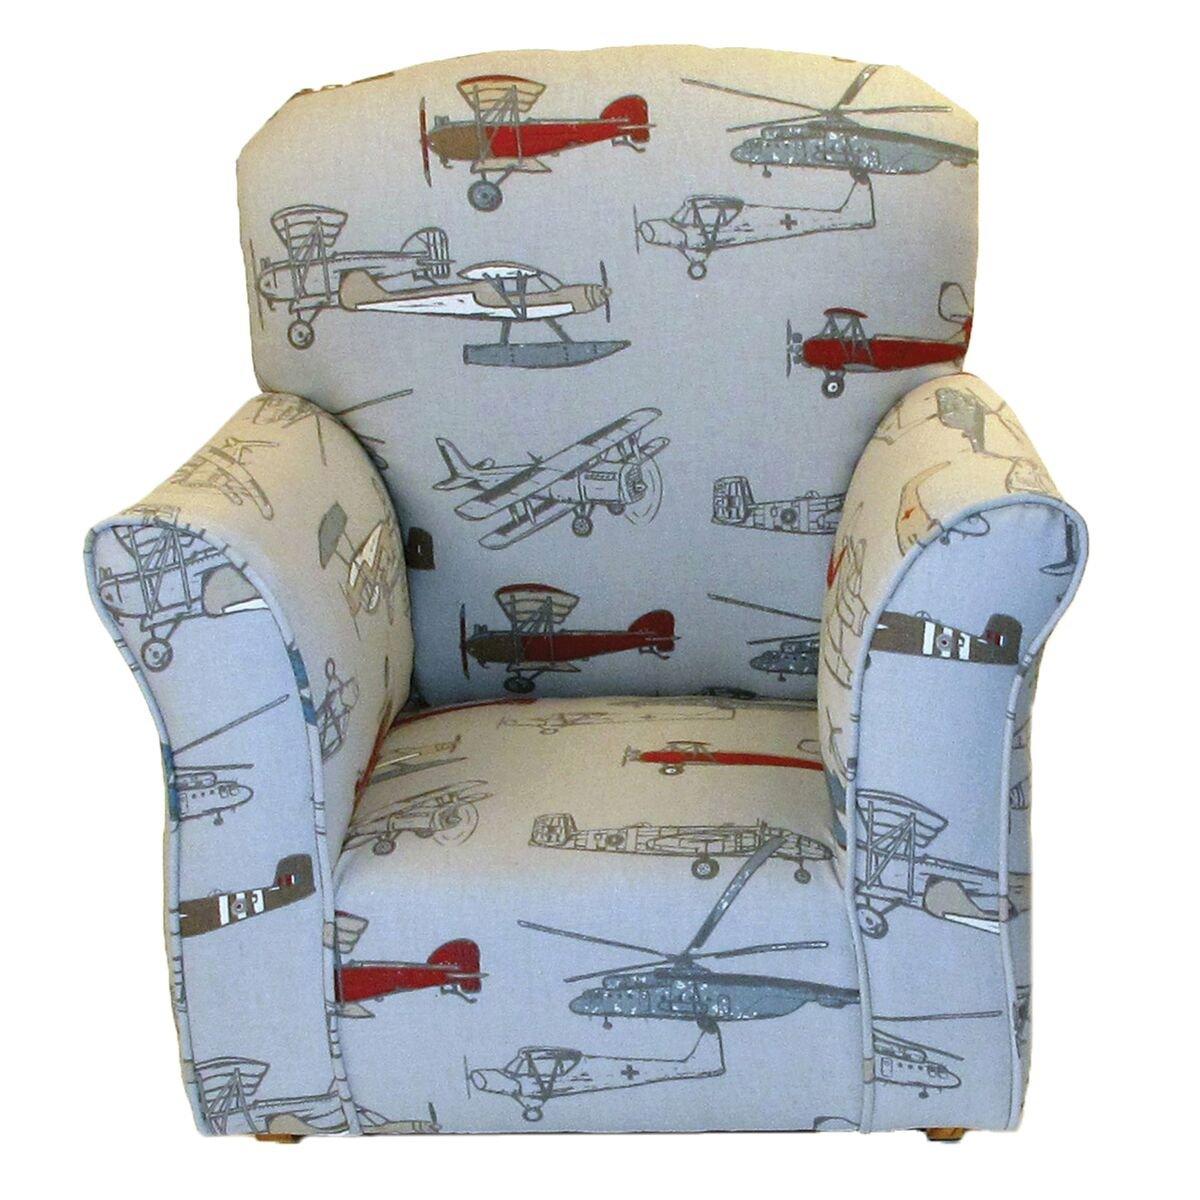 Brighton Home Furniture Airplane Print Toddler Rocker - Cotton Rocking Chair 1753-CR1000AP